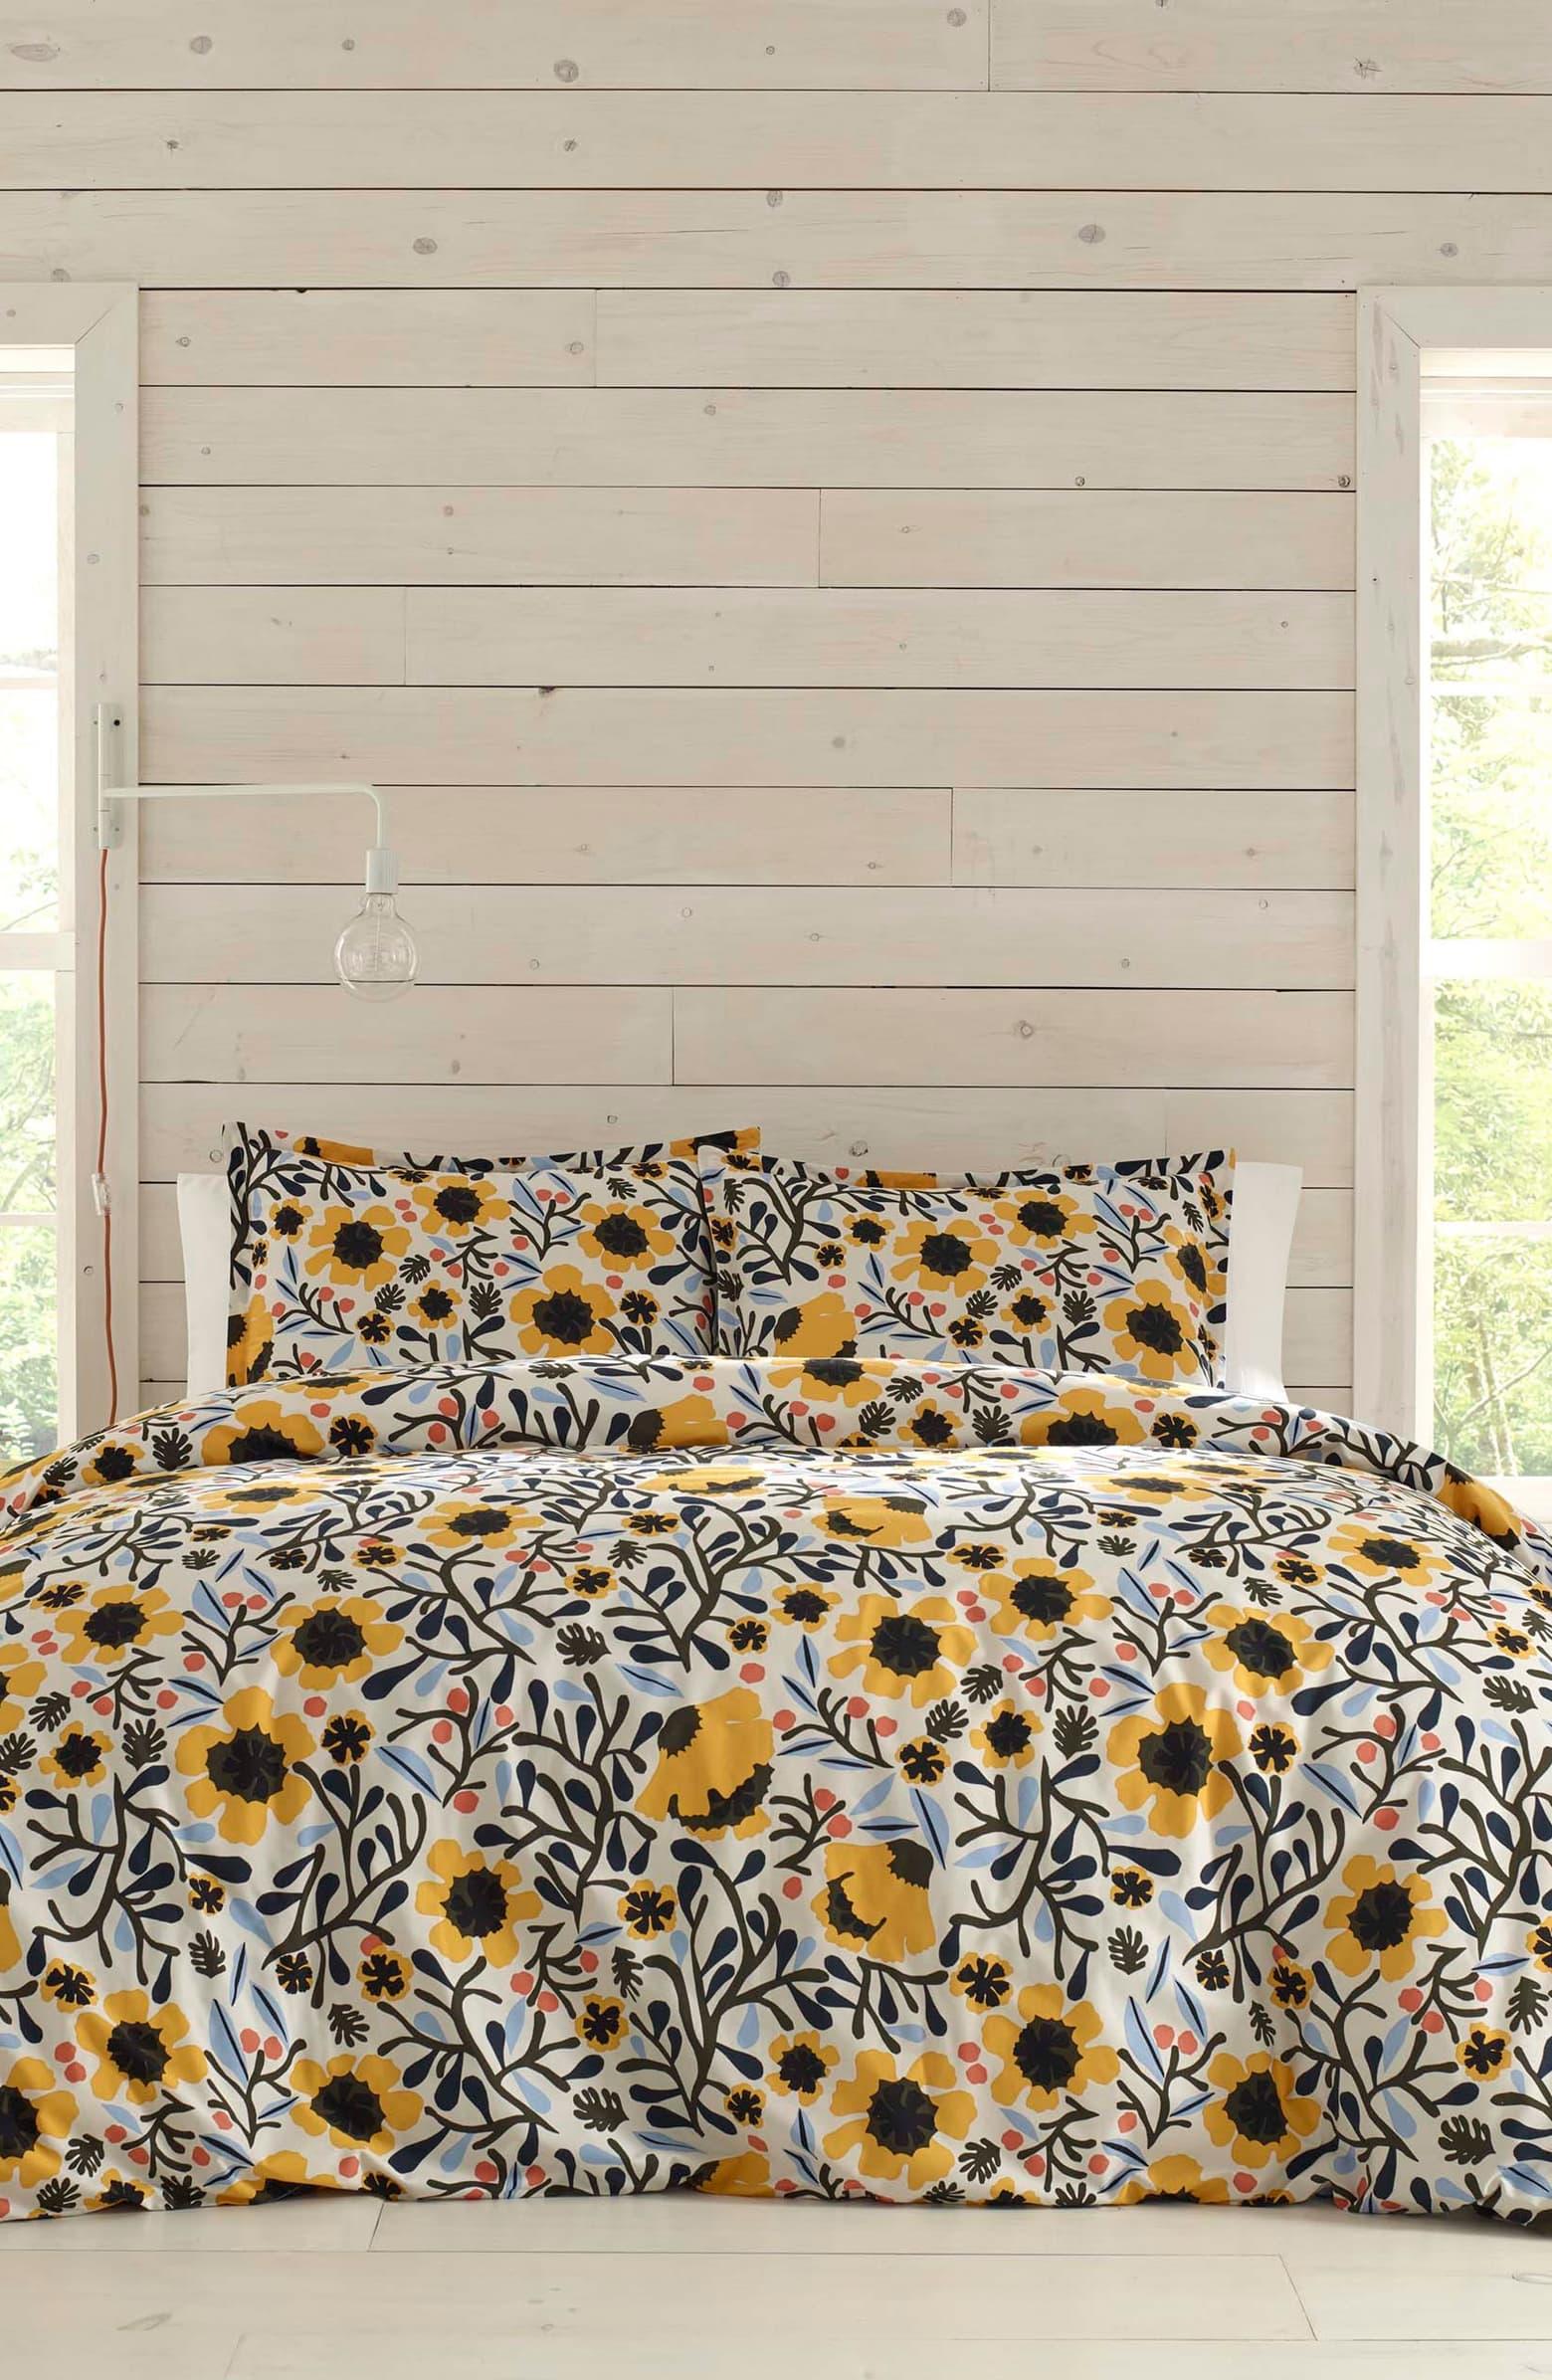 Mykero Comforter _ Sham Set